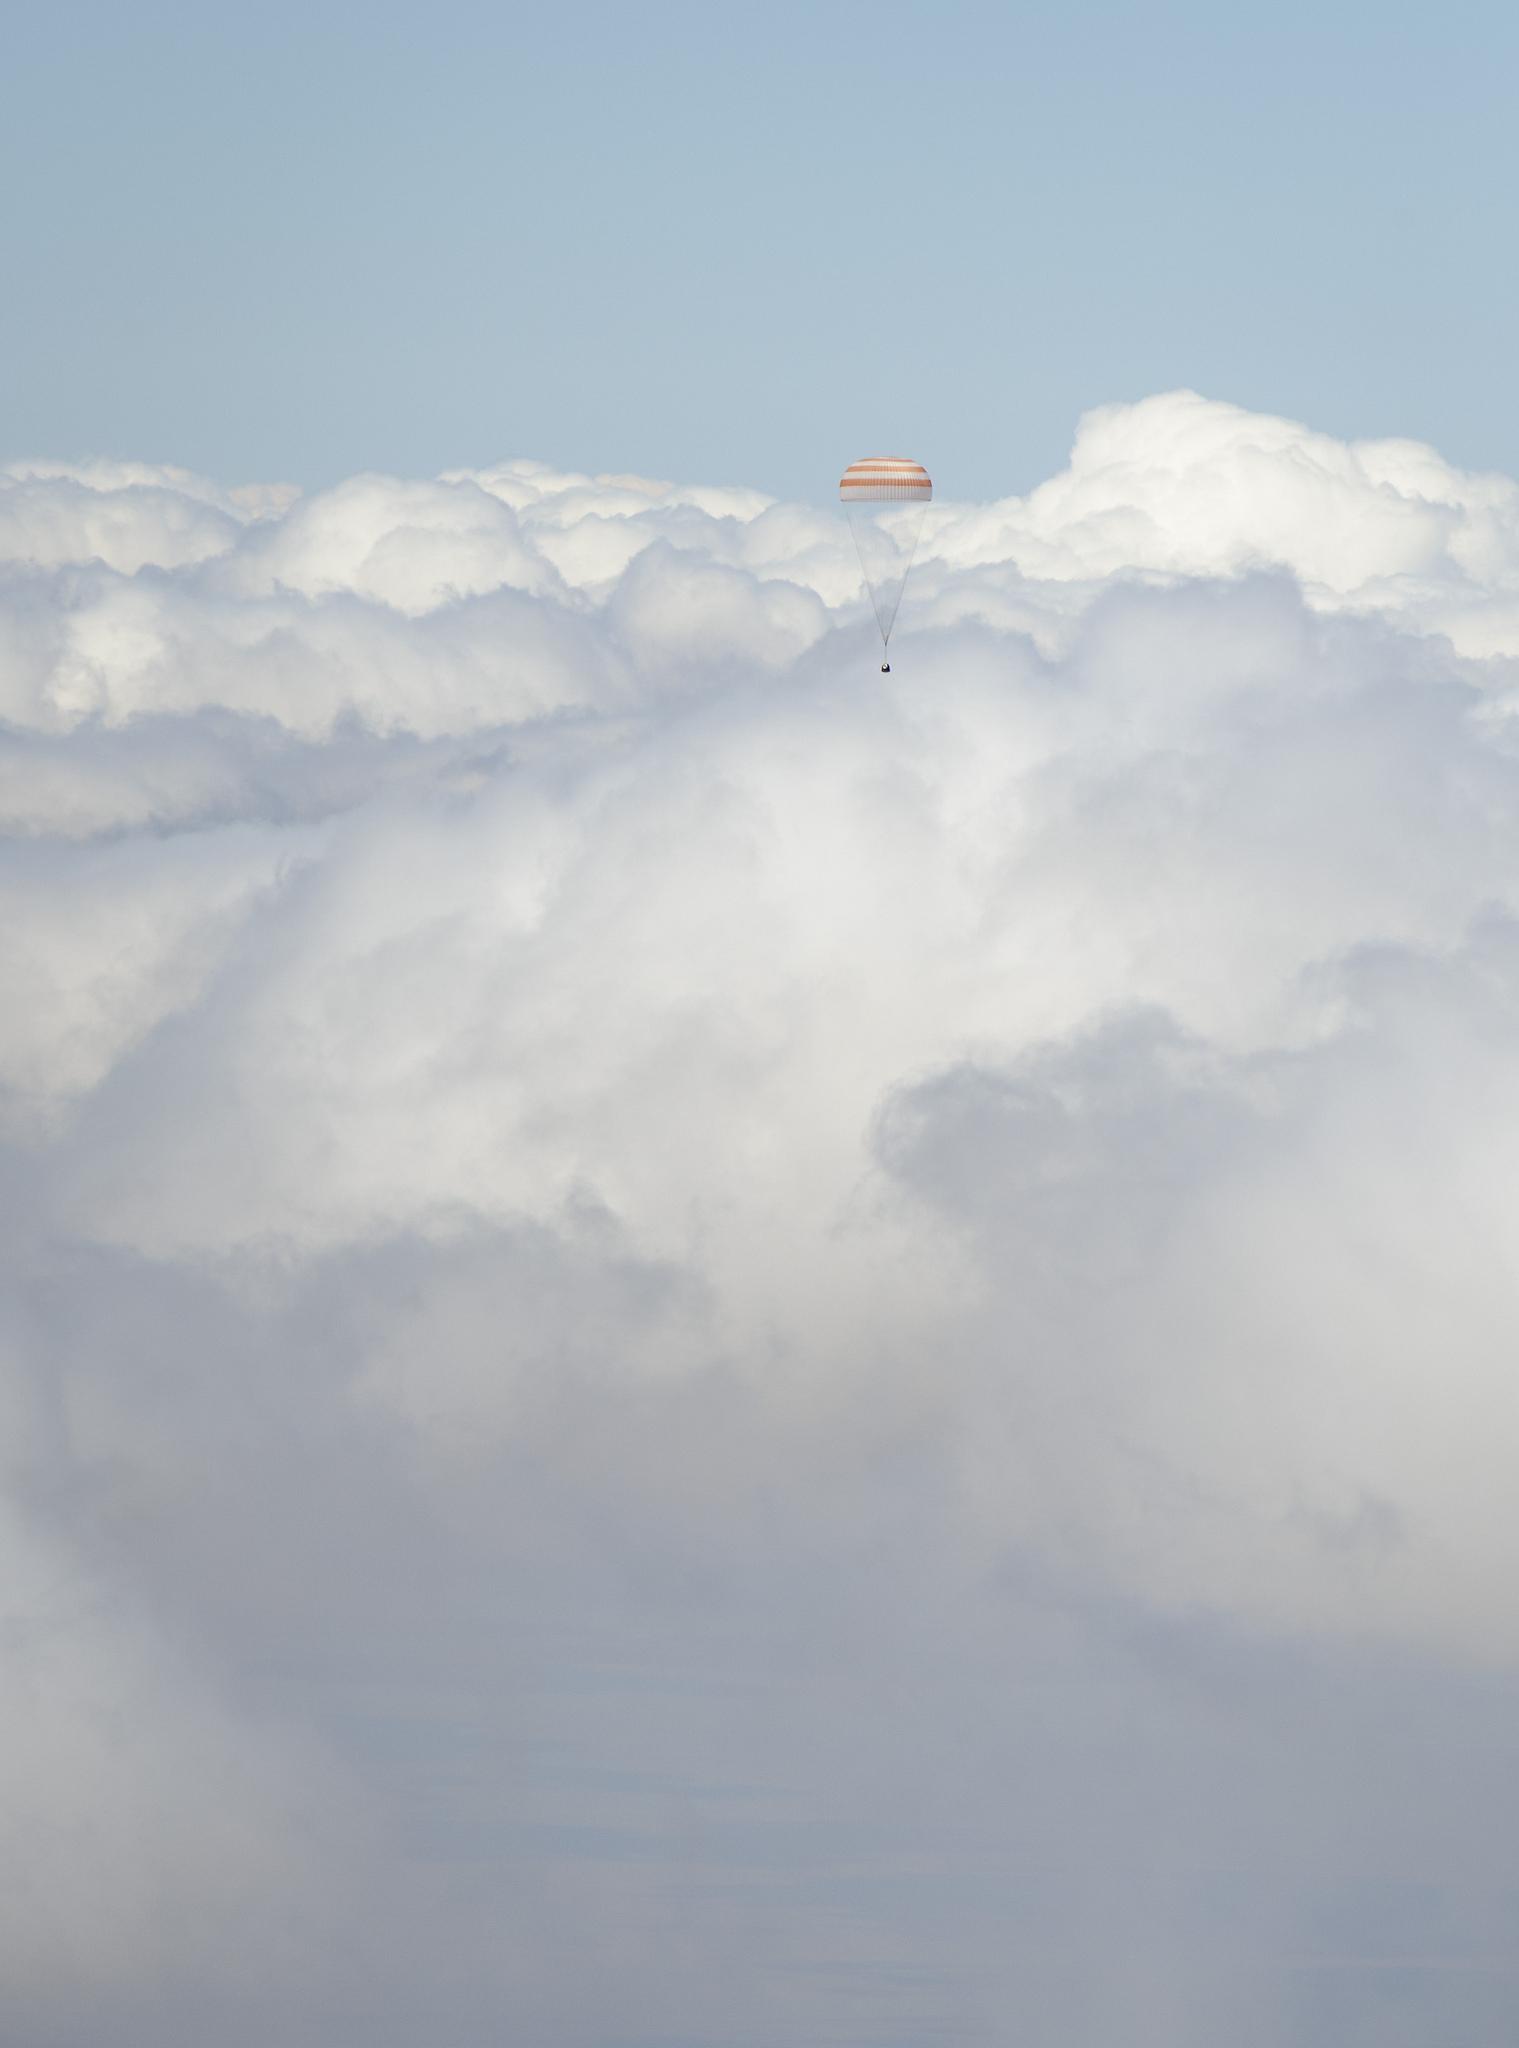 Expedition 31: Soyuz Gumdrop in the Clouds